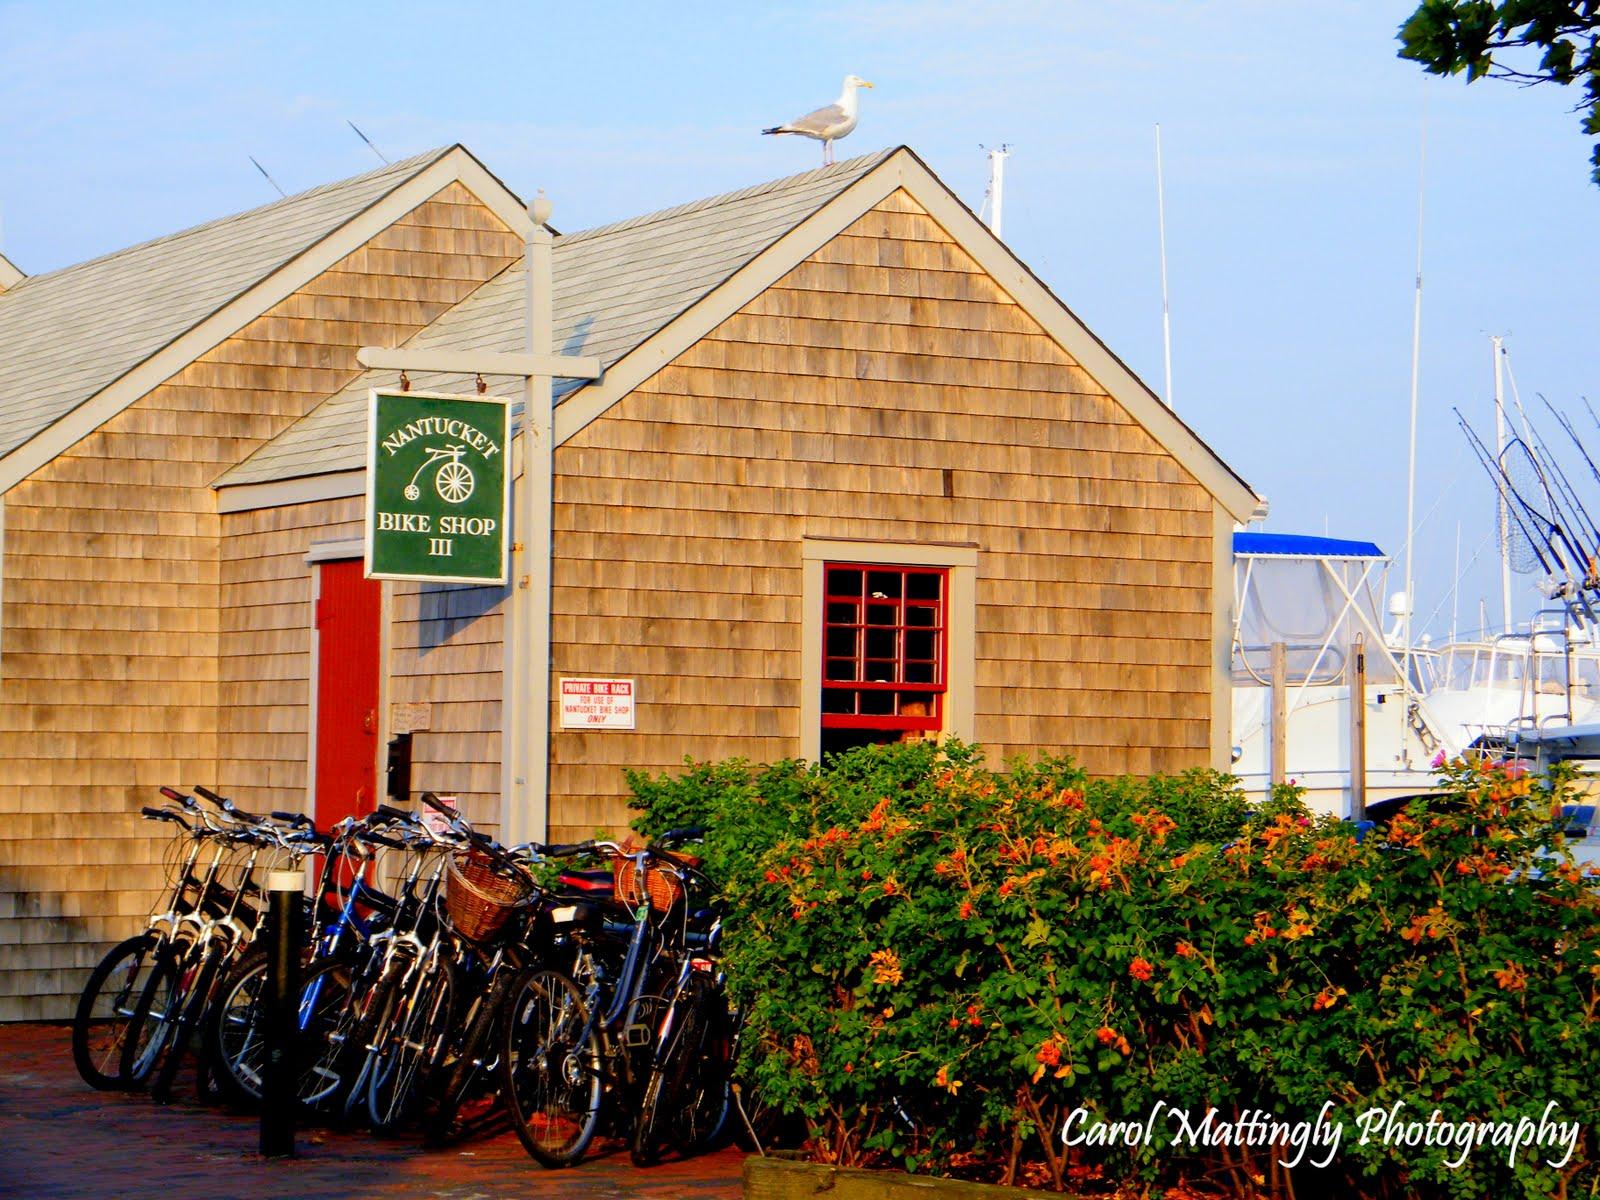 Carol Mattingly Photography: Cape Cod Trip 2010, Nantucket ...